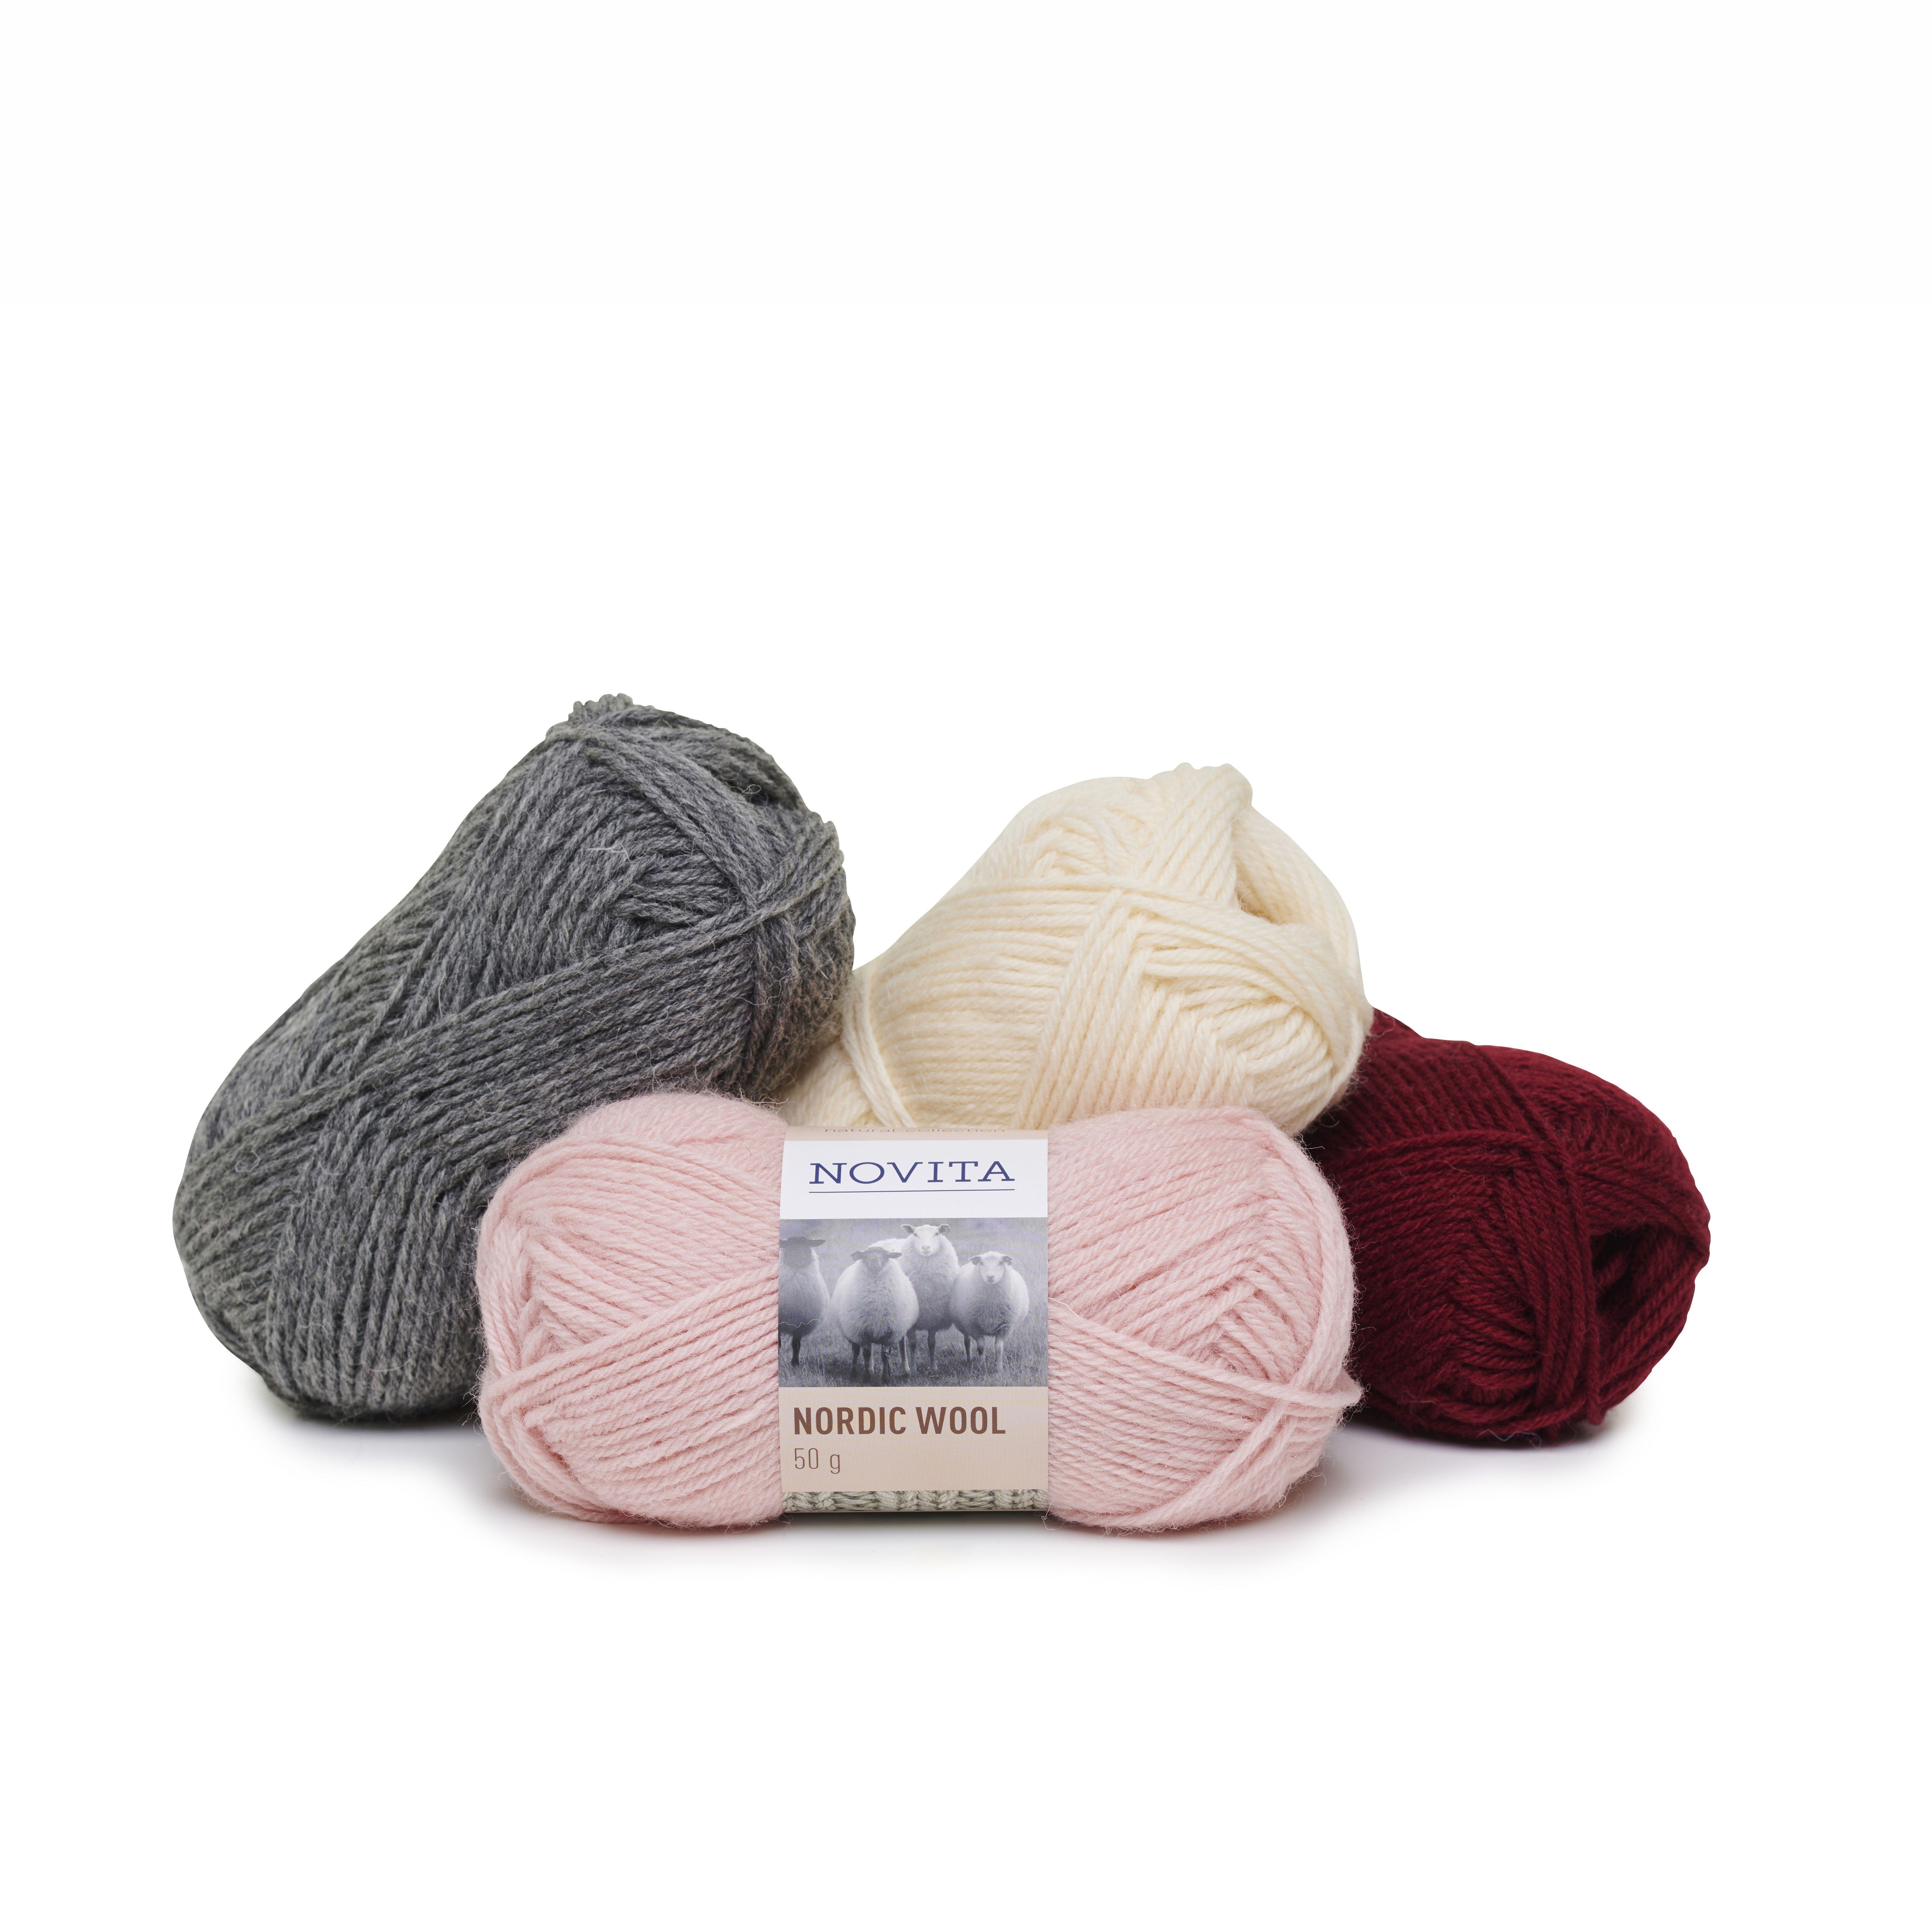 Novita Nordic Wool | Novita knits en 2020 | Laine, Moutons